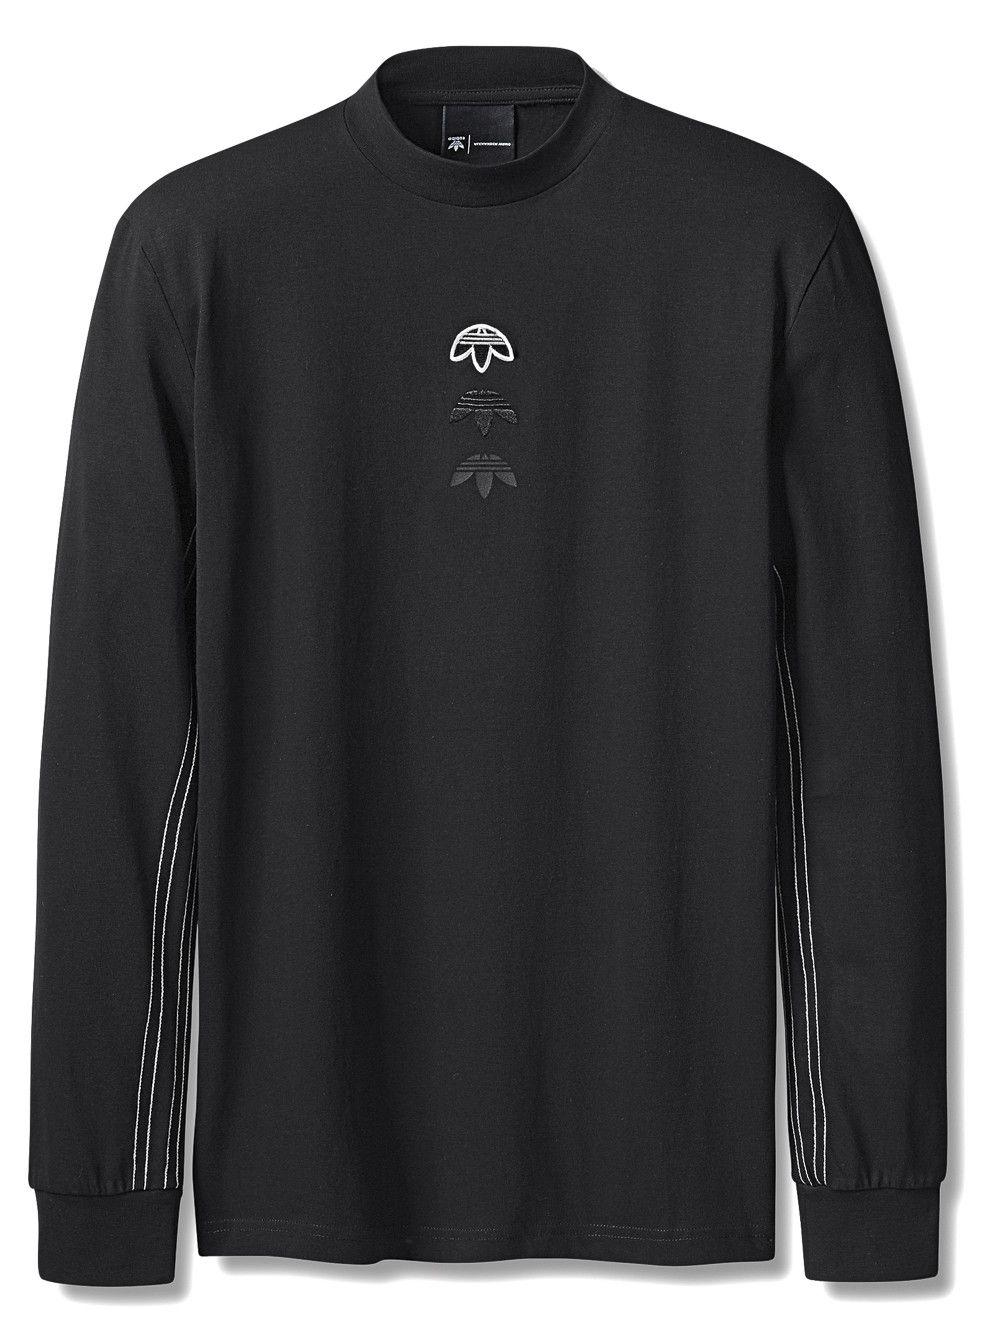 Black · ADIDAS ORIGINALS BY ALEXANDER WANG Long Sleeve Logo Tee ...